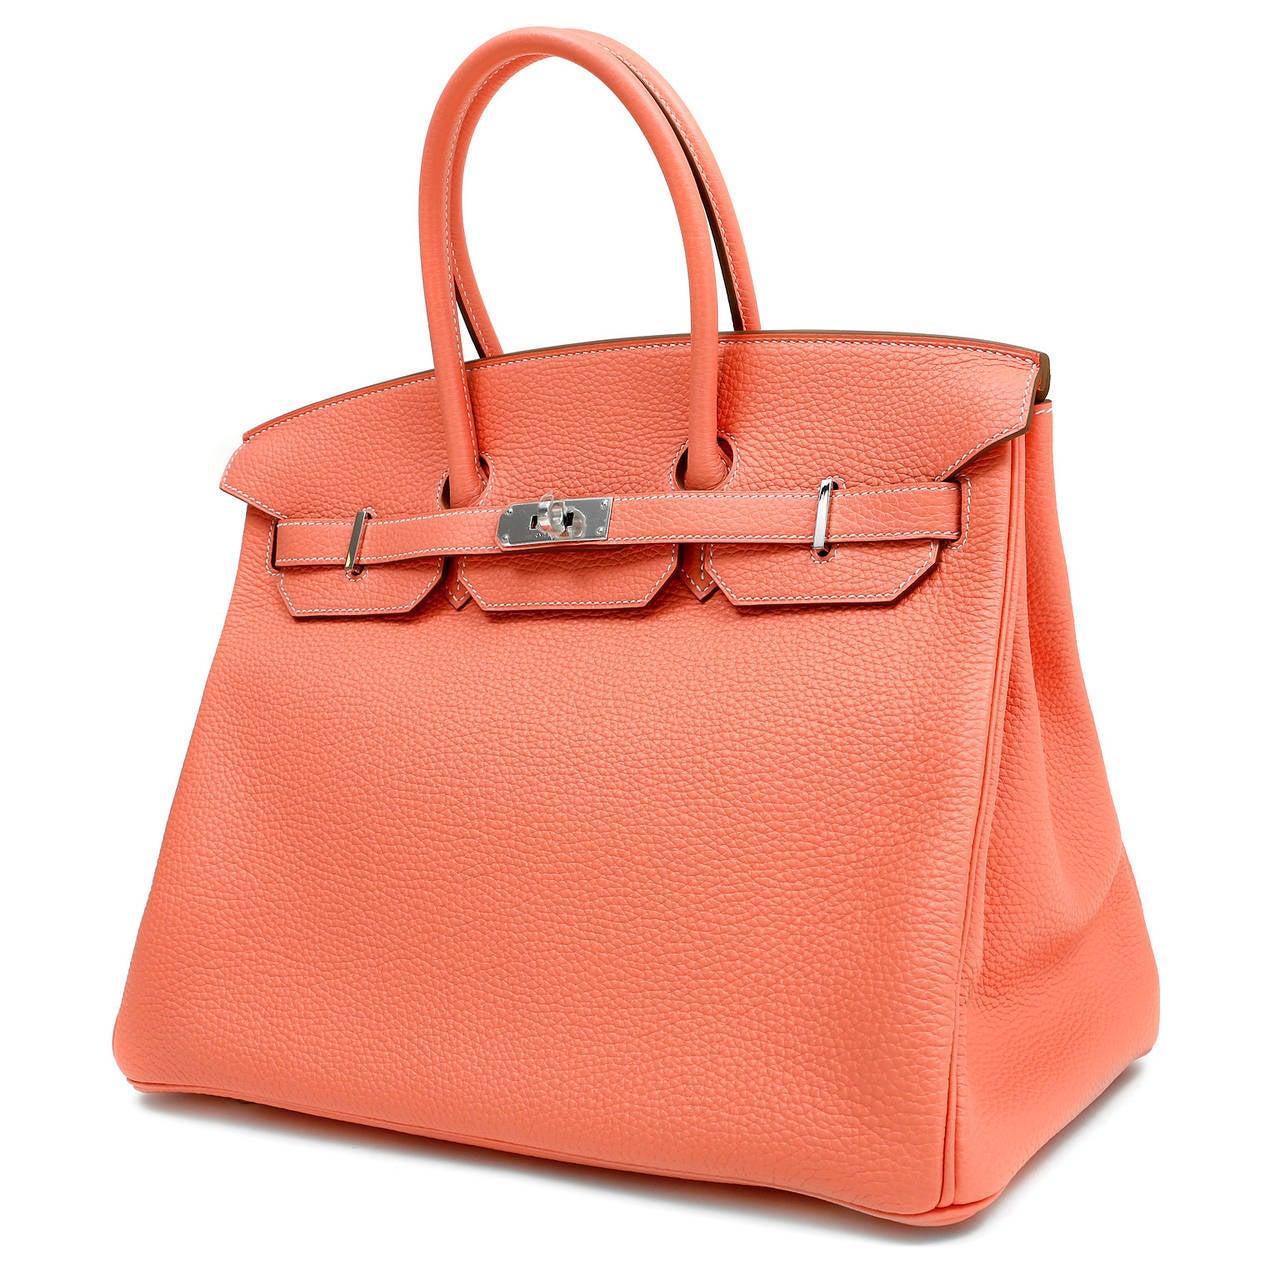 Hermes Crevette Togo 35 cm Birkin Bag- Salmon Pink Color In New Never_worn Condition For Sale In Malibu, CA